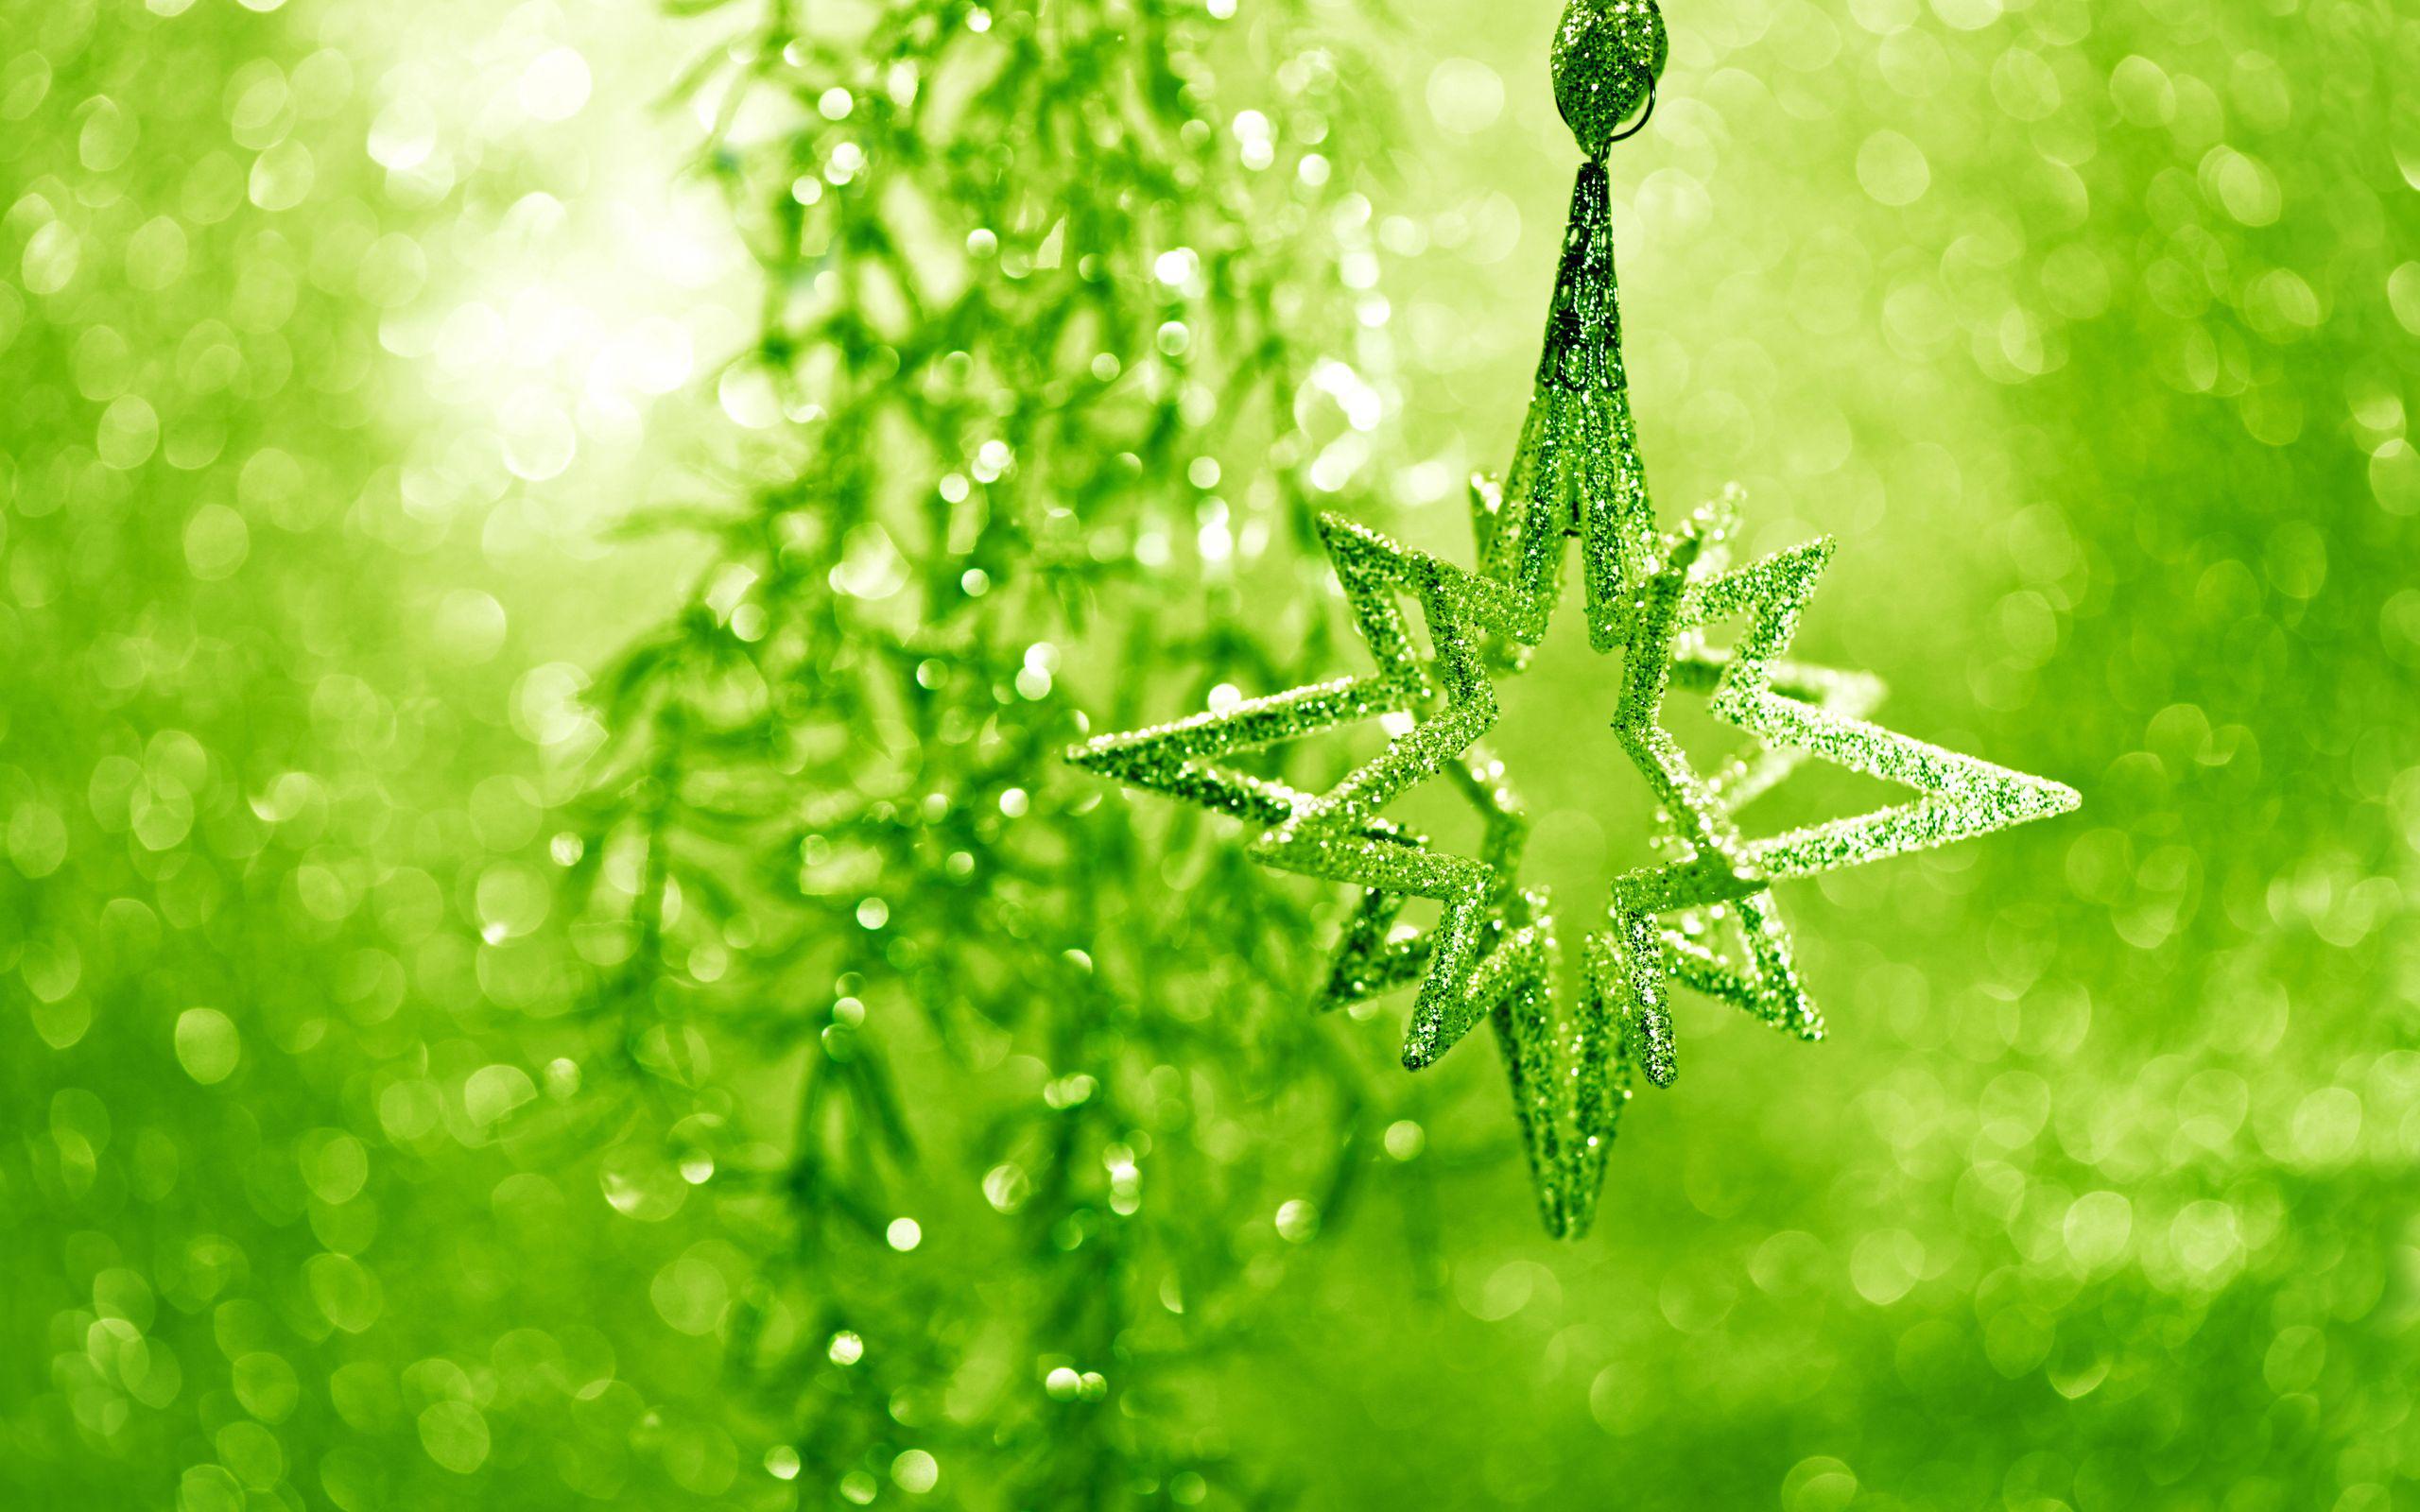 Christmas HD Wallpaper | Background Image | 2560x1600 | ID